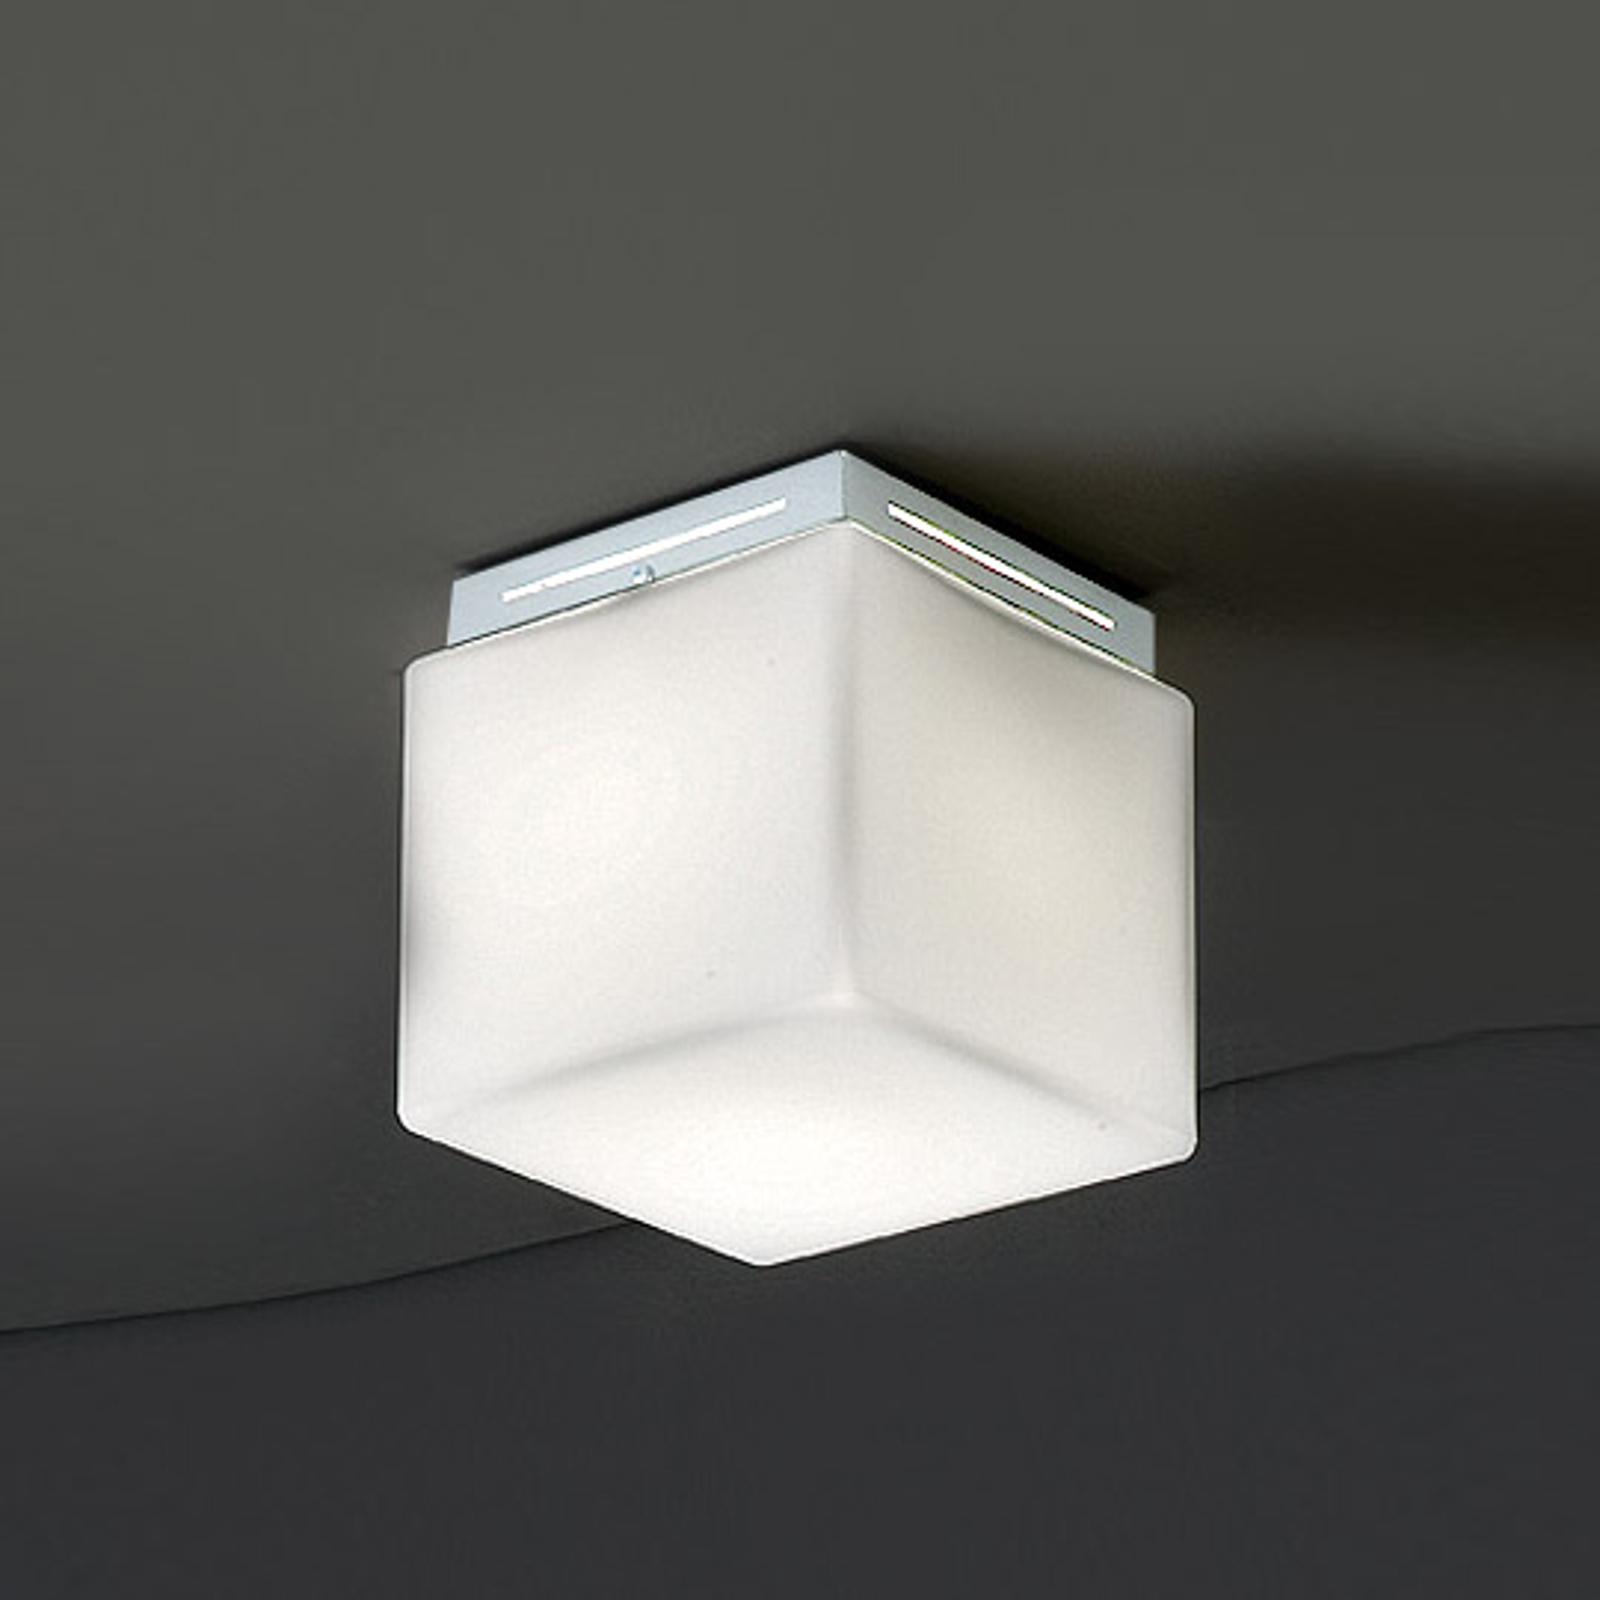 Cubis taklampe i hvit